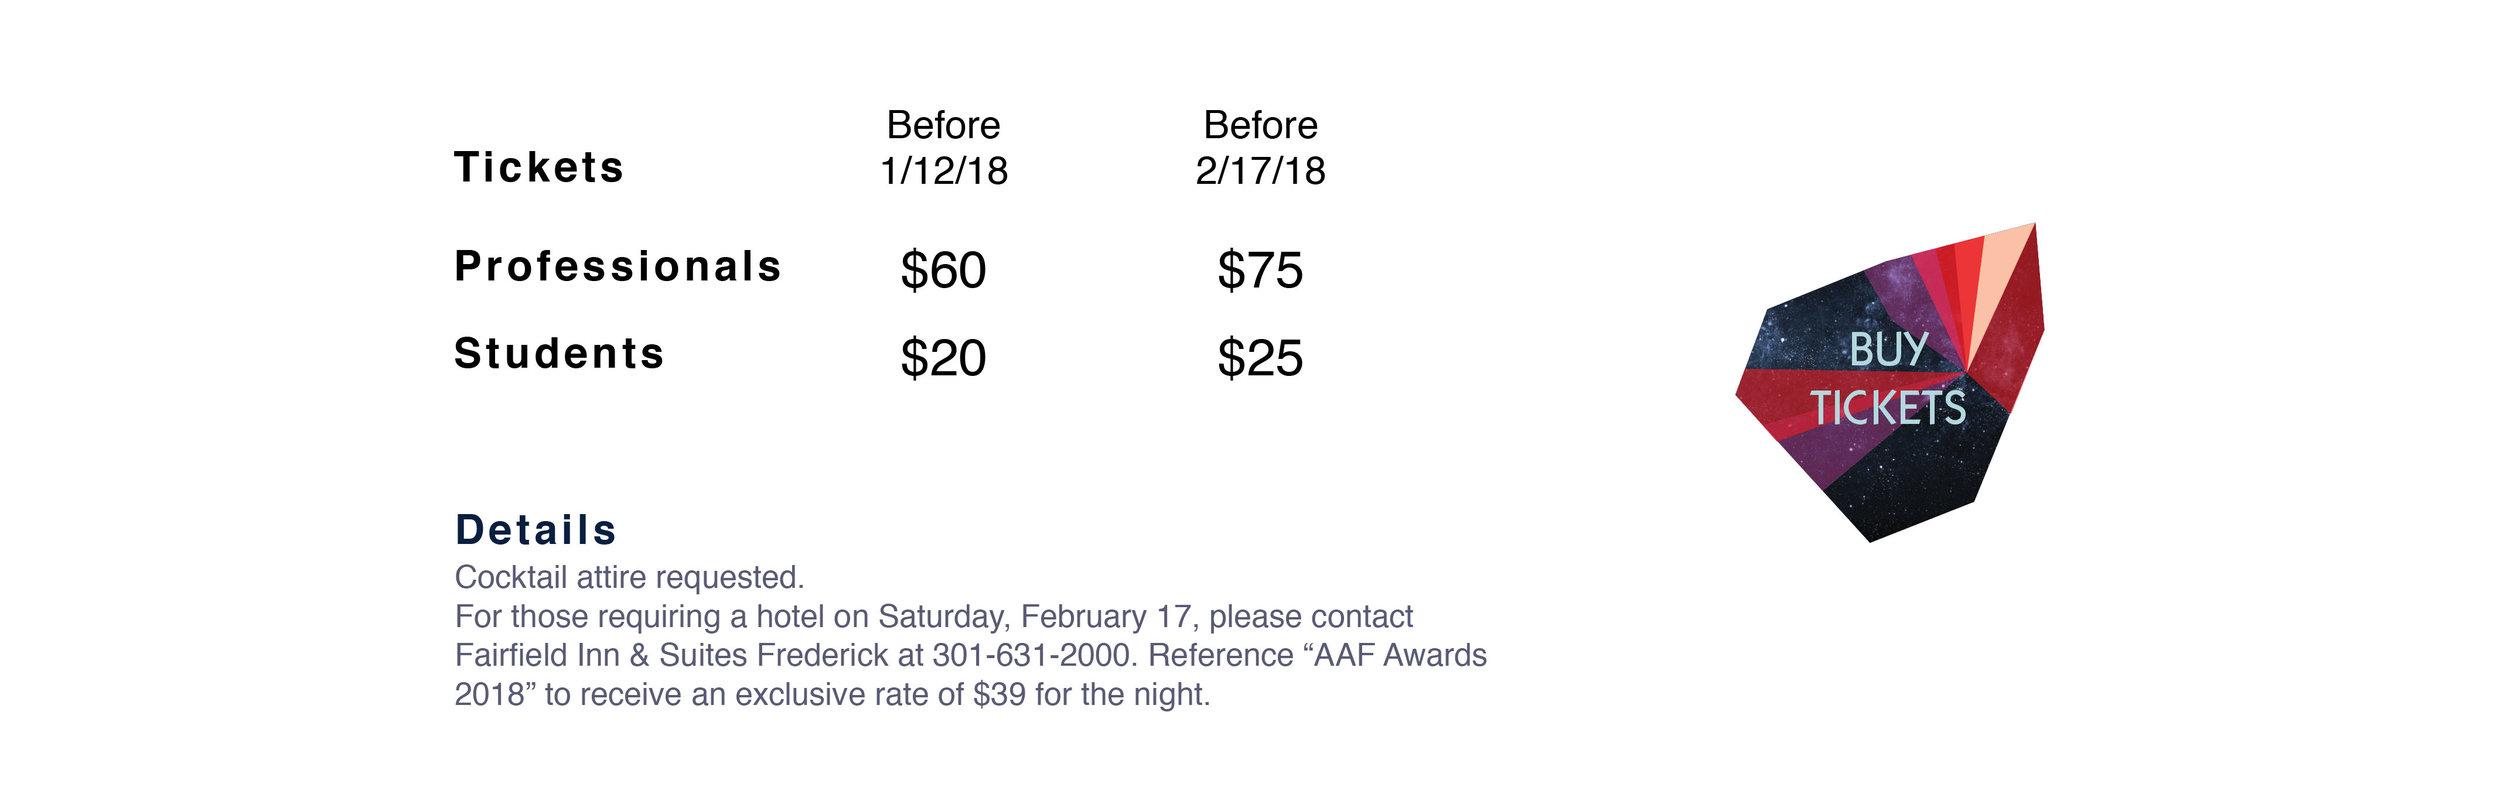 RESIZED Ticket Fees Info UPDATED.jpg